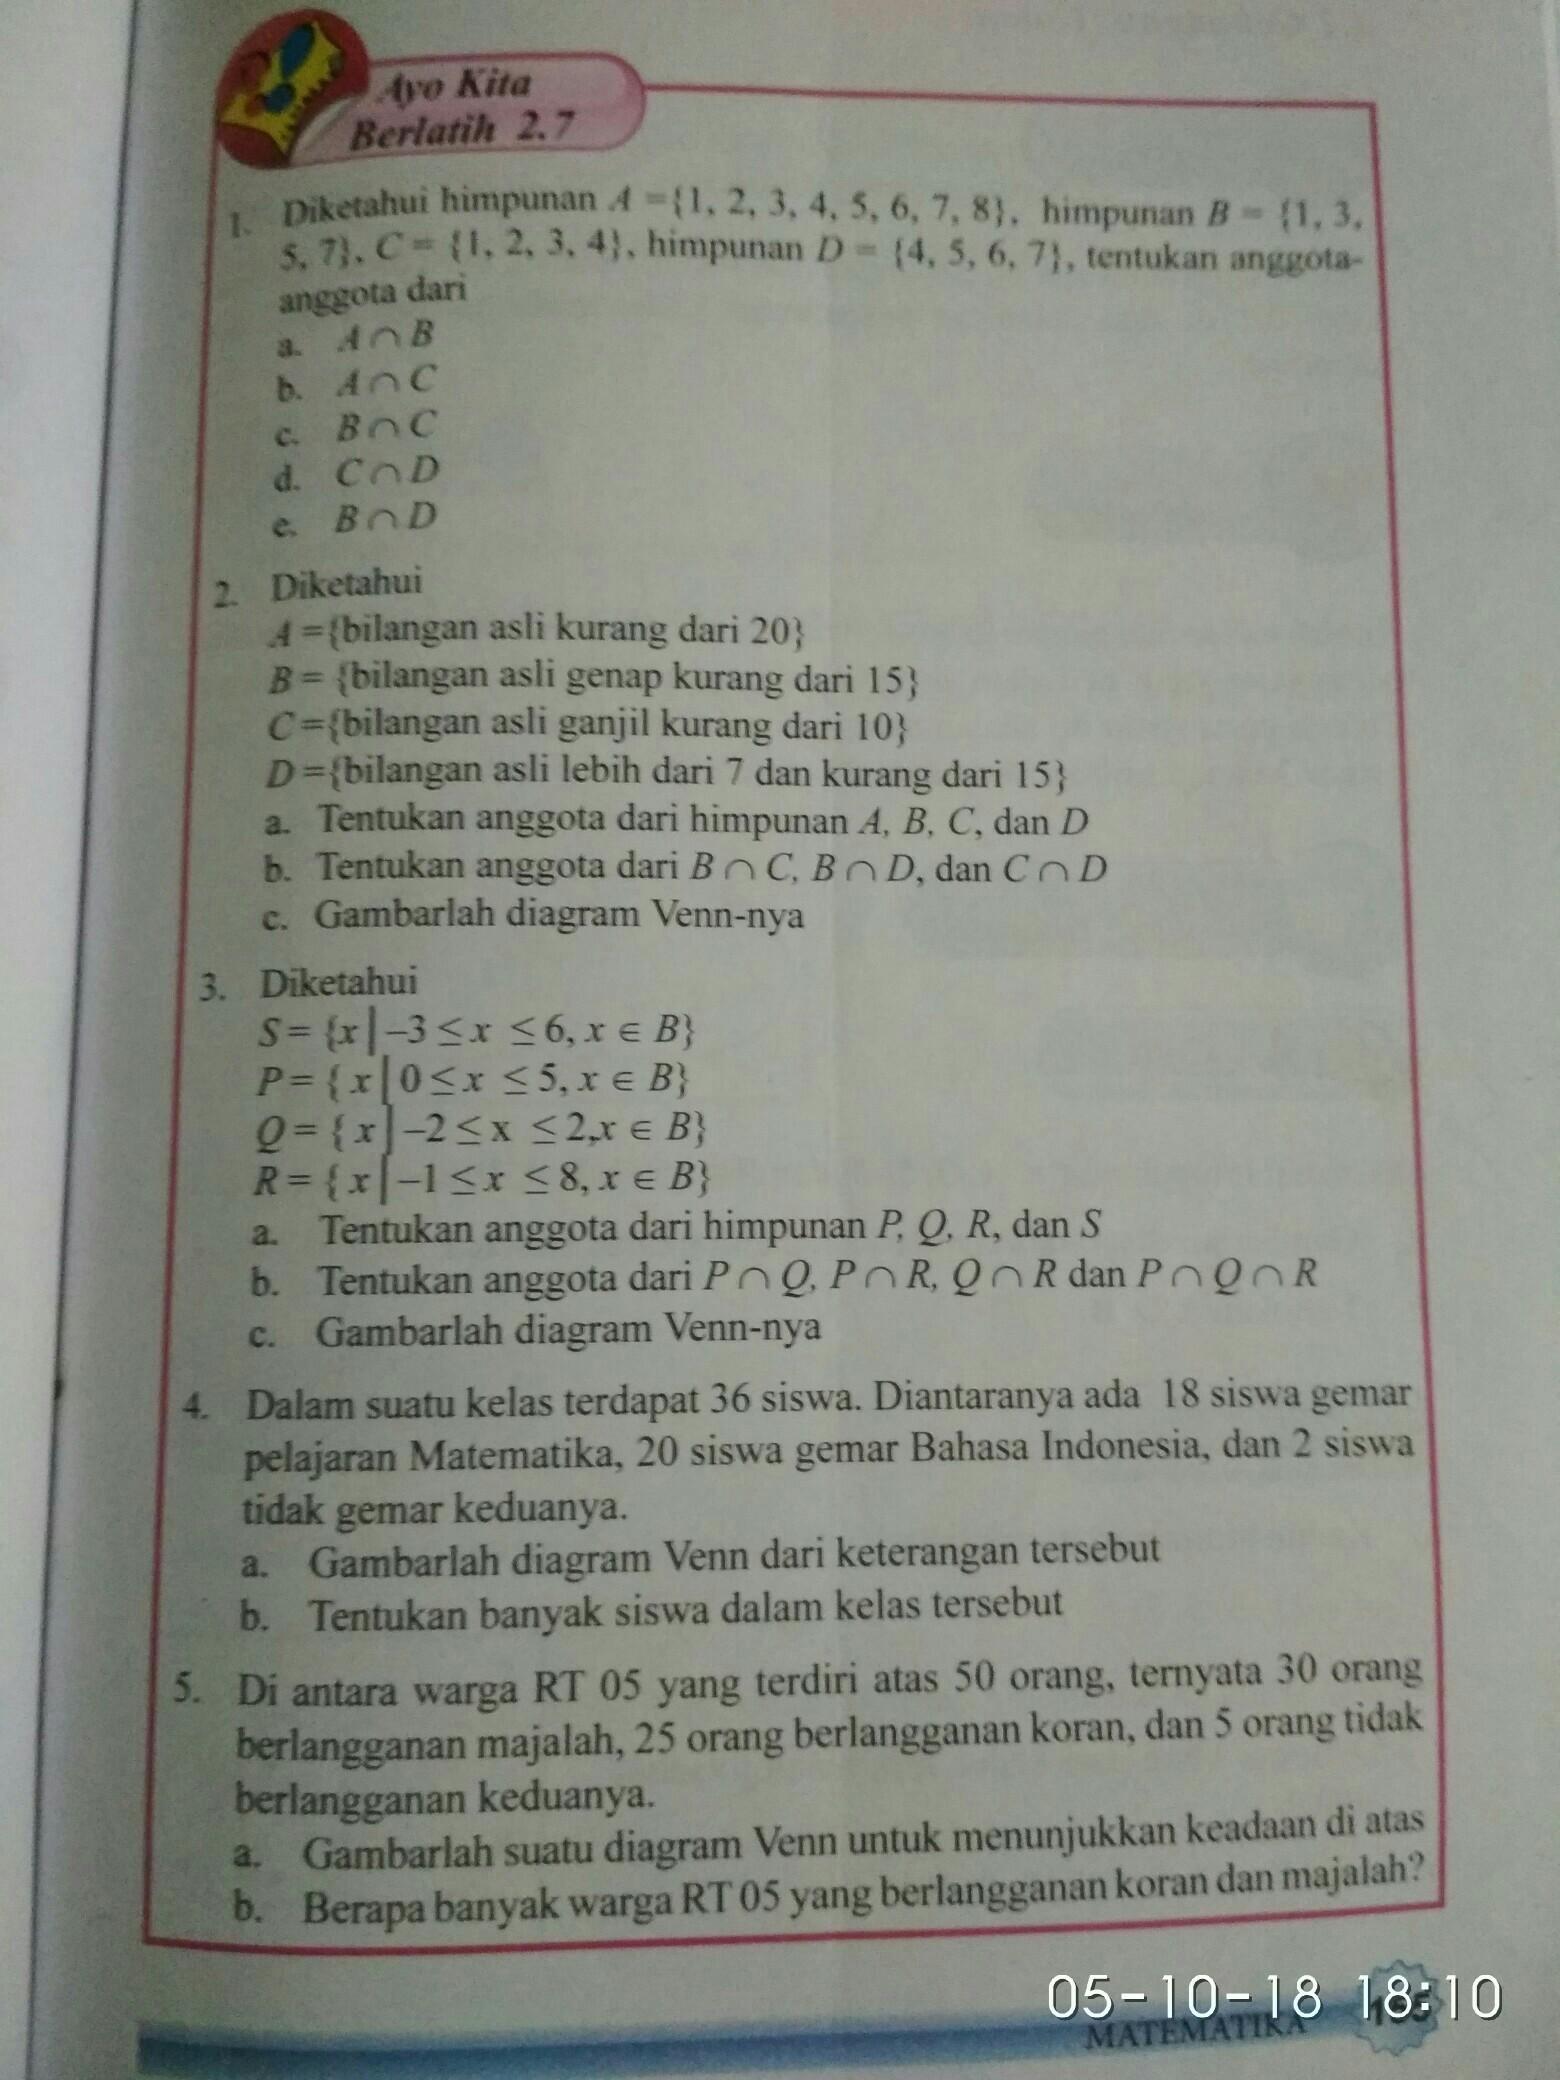 Ayo Kita Berlatih 2 7 Halaman 155 Kelas 7 Kurikulum 2013 Brainly